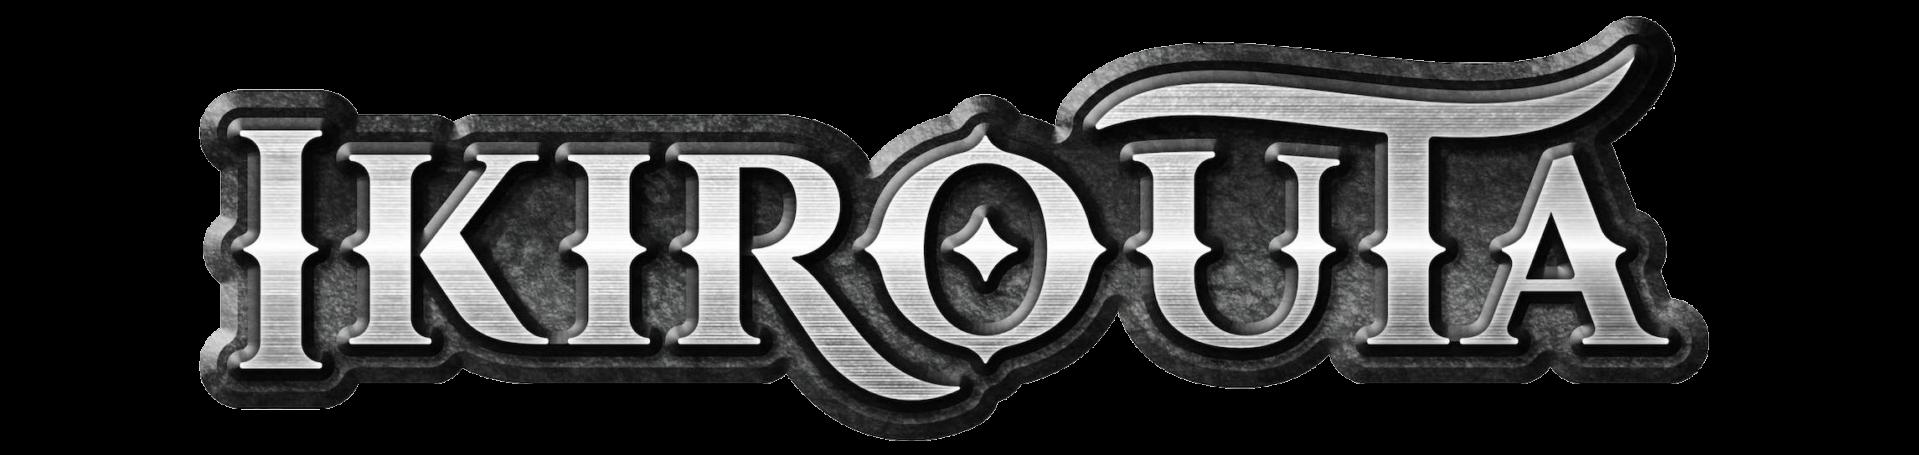 Ikirouta logo